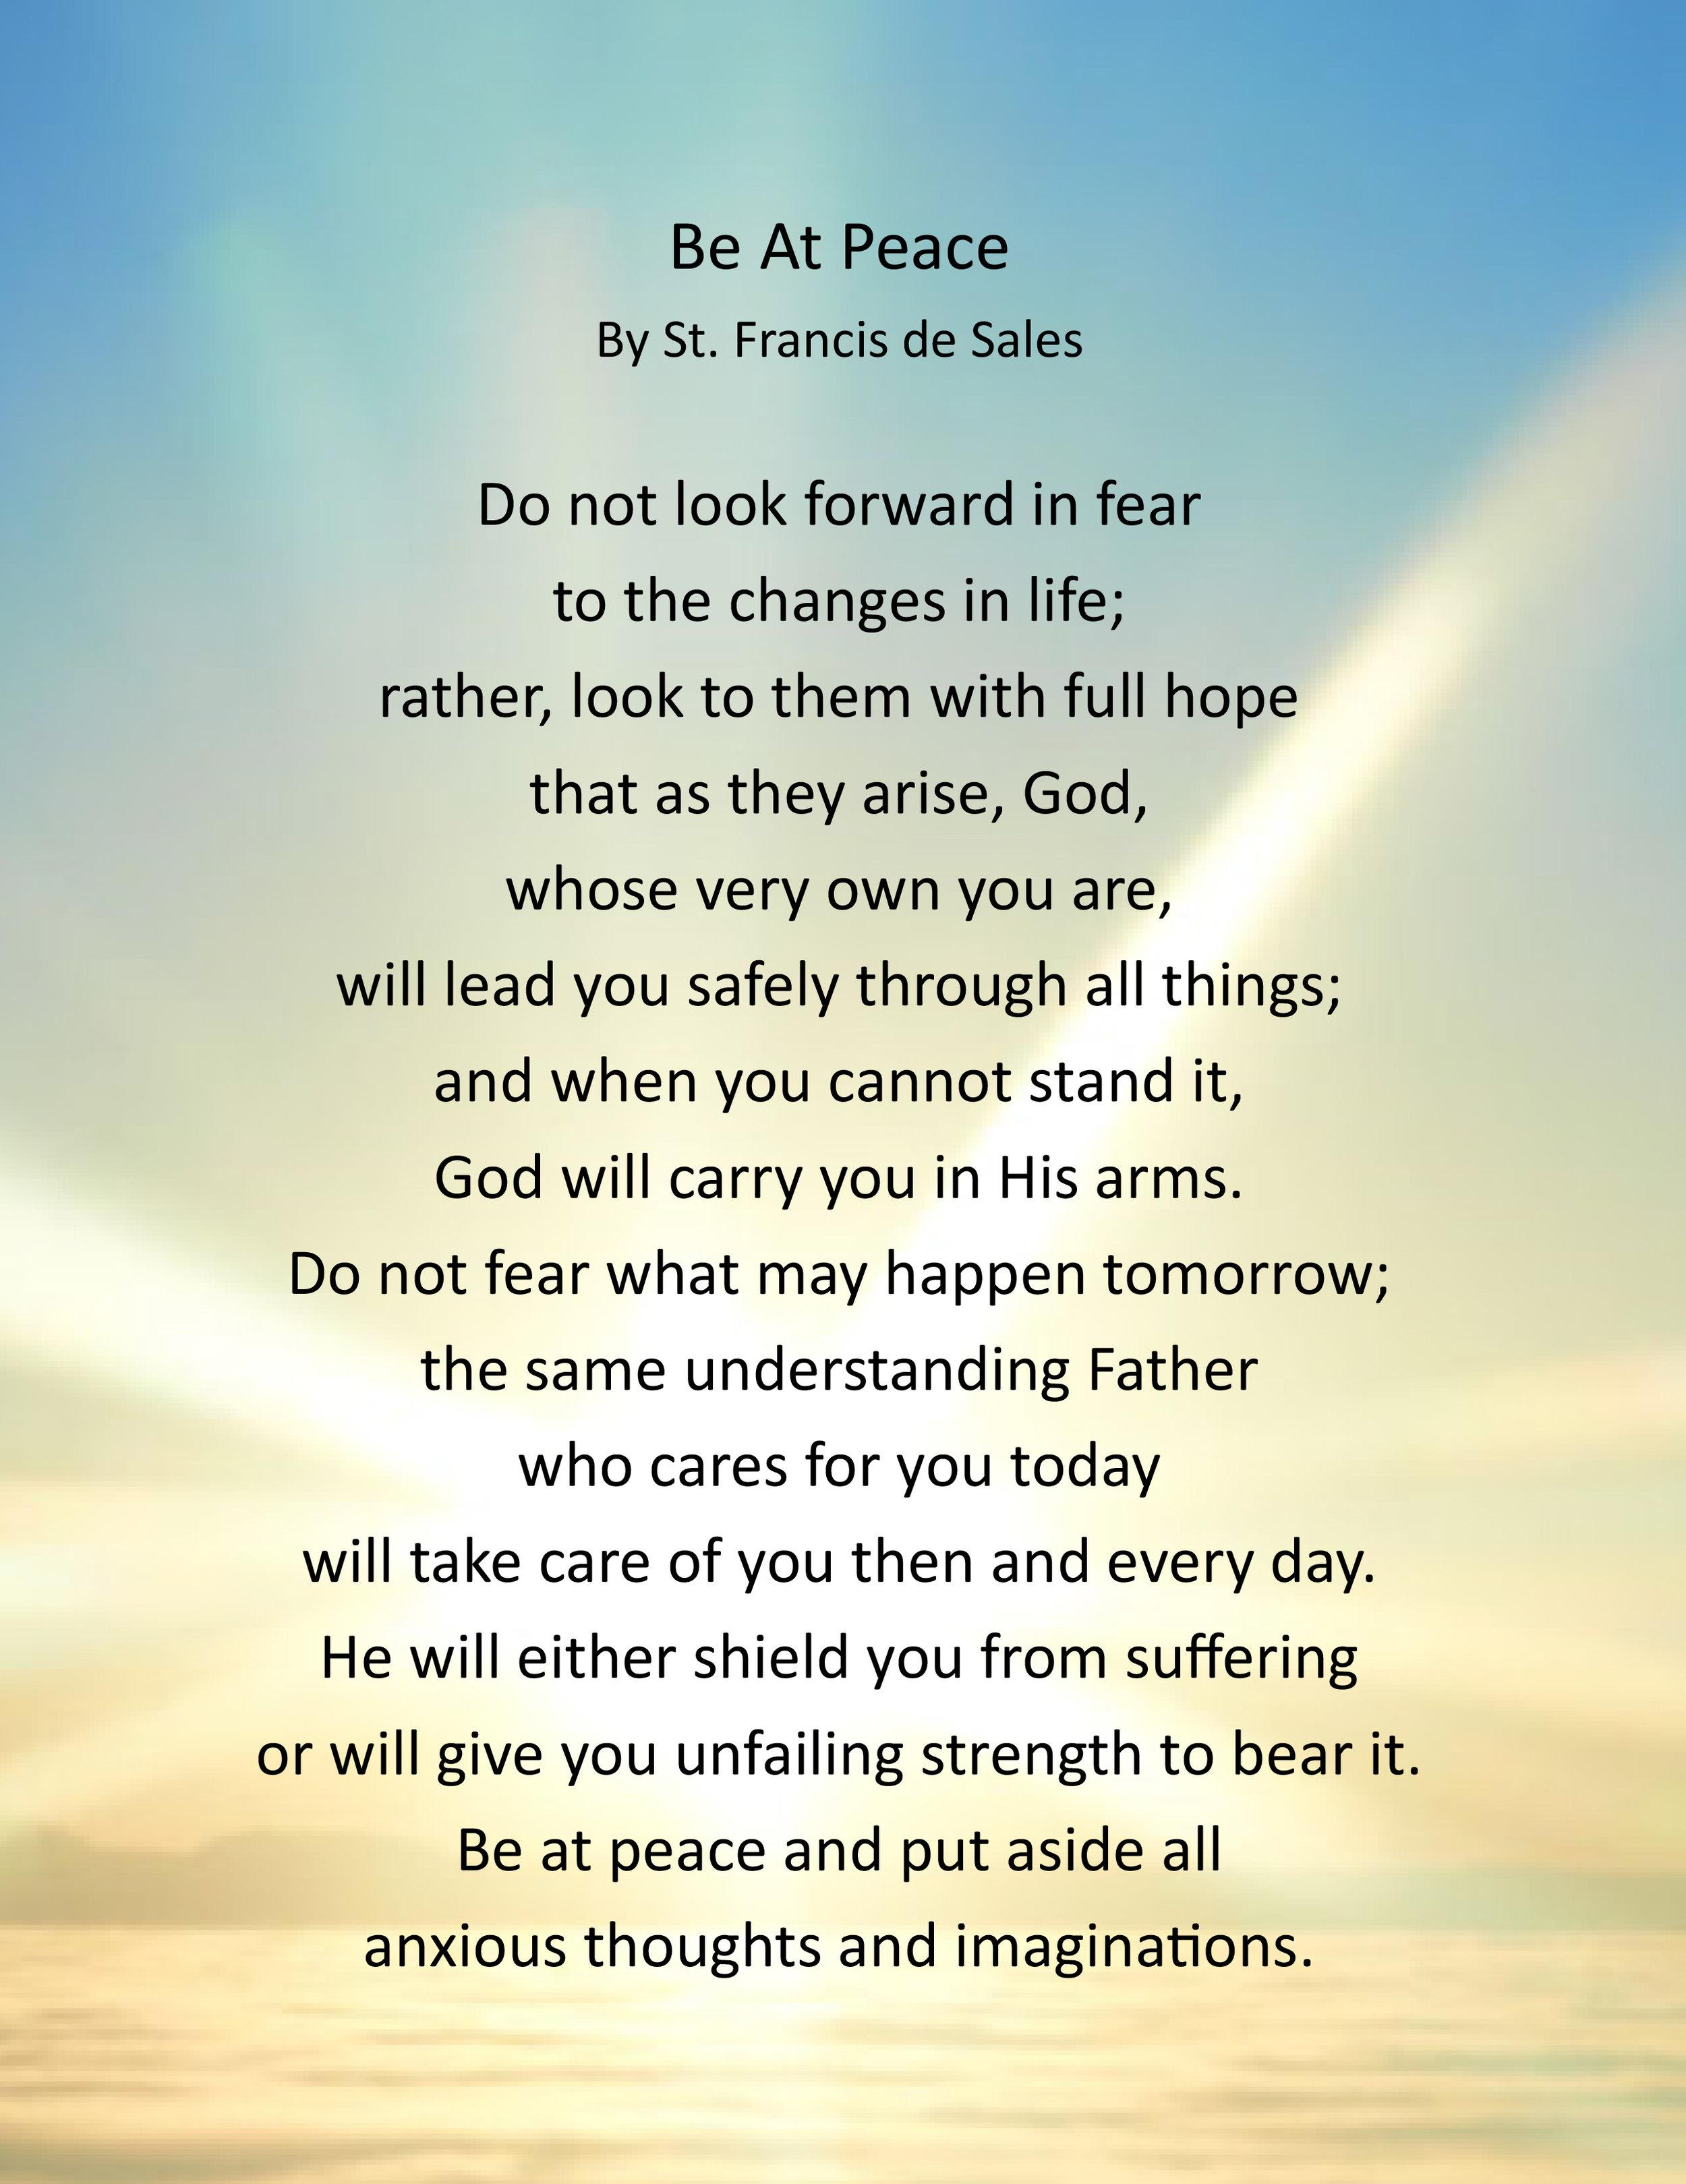 Be At Peace poem.jpg